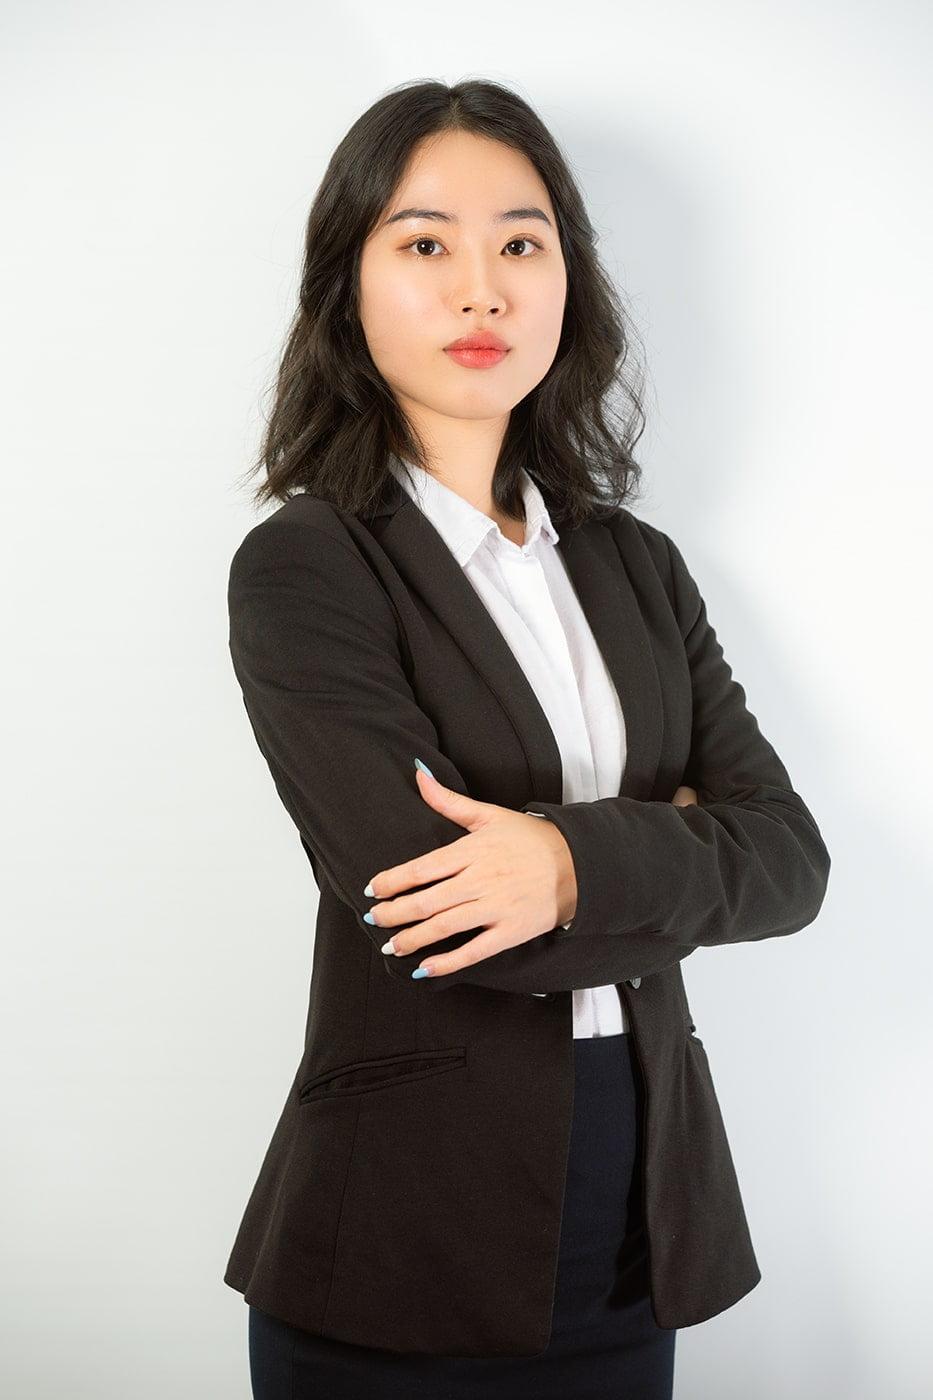 Profile cong ty 22 - Album chụp ảnh profile công ty Luật Dzungsrt Law - HThao Studio